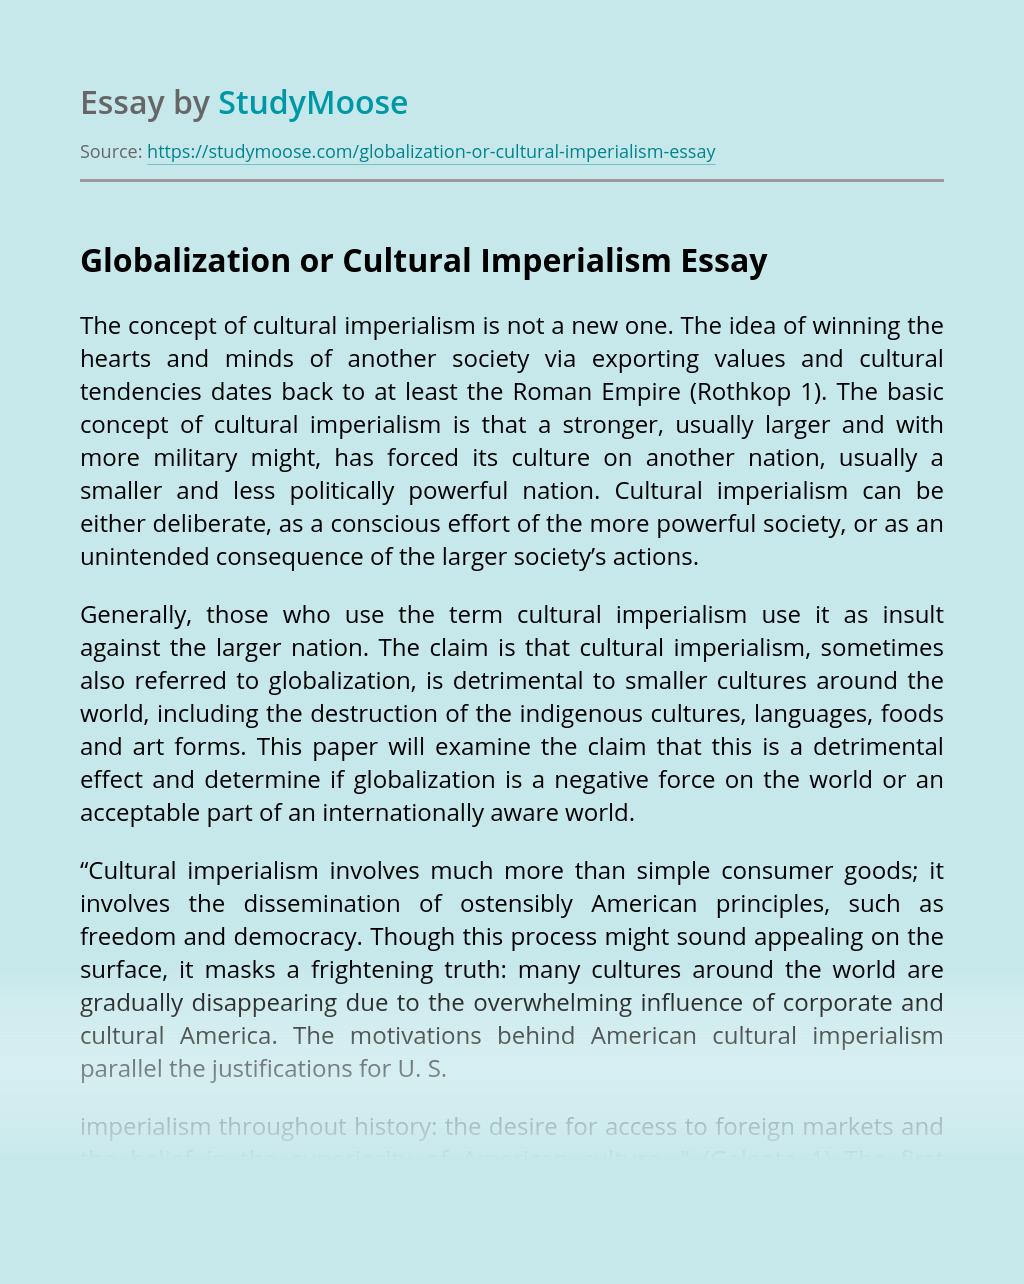 Globalization or Cultural Imperialism